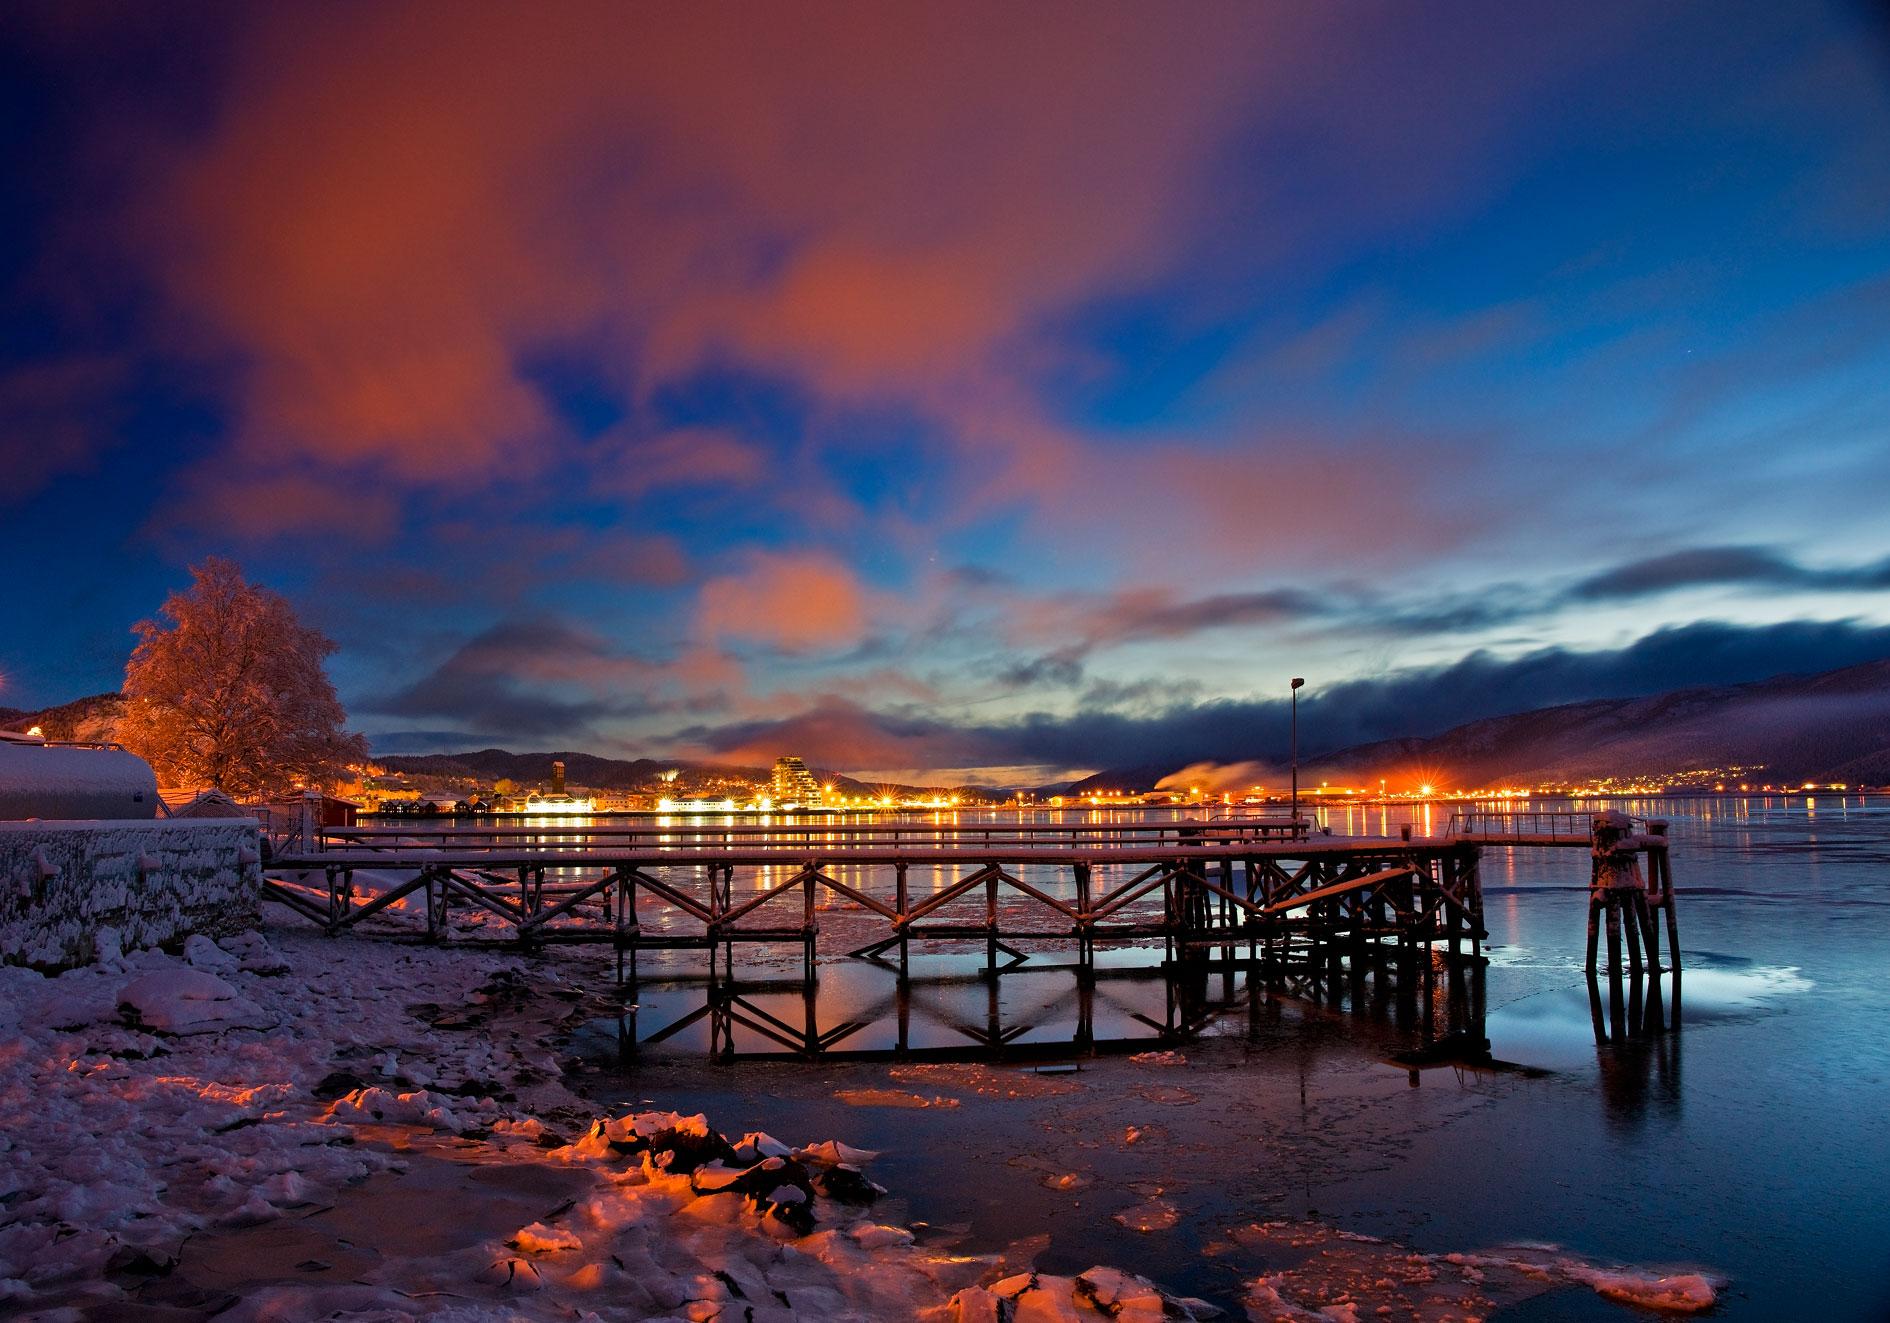 Vinter i Namsos. Foto: Steinar Johansen